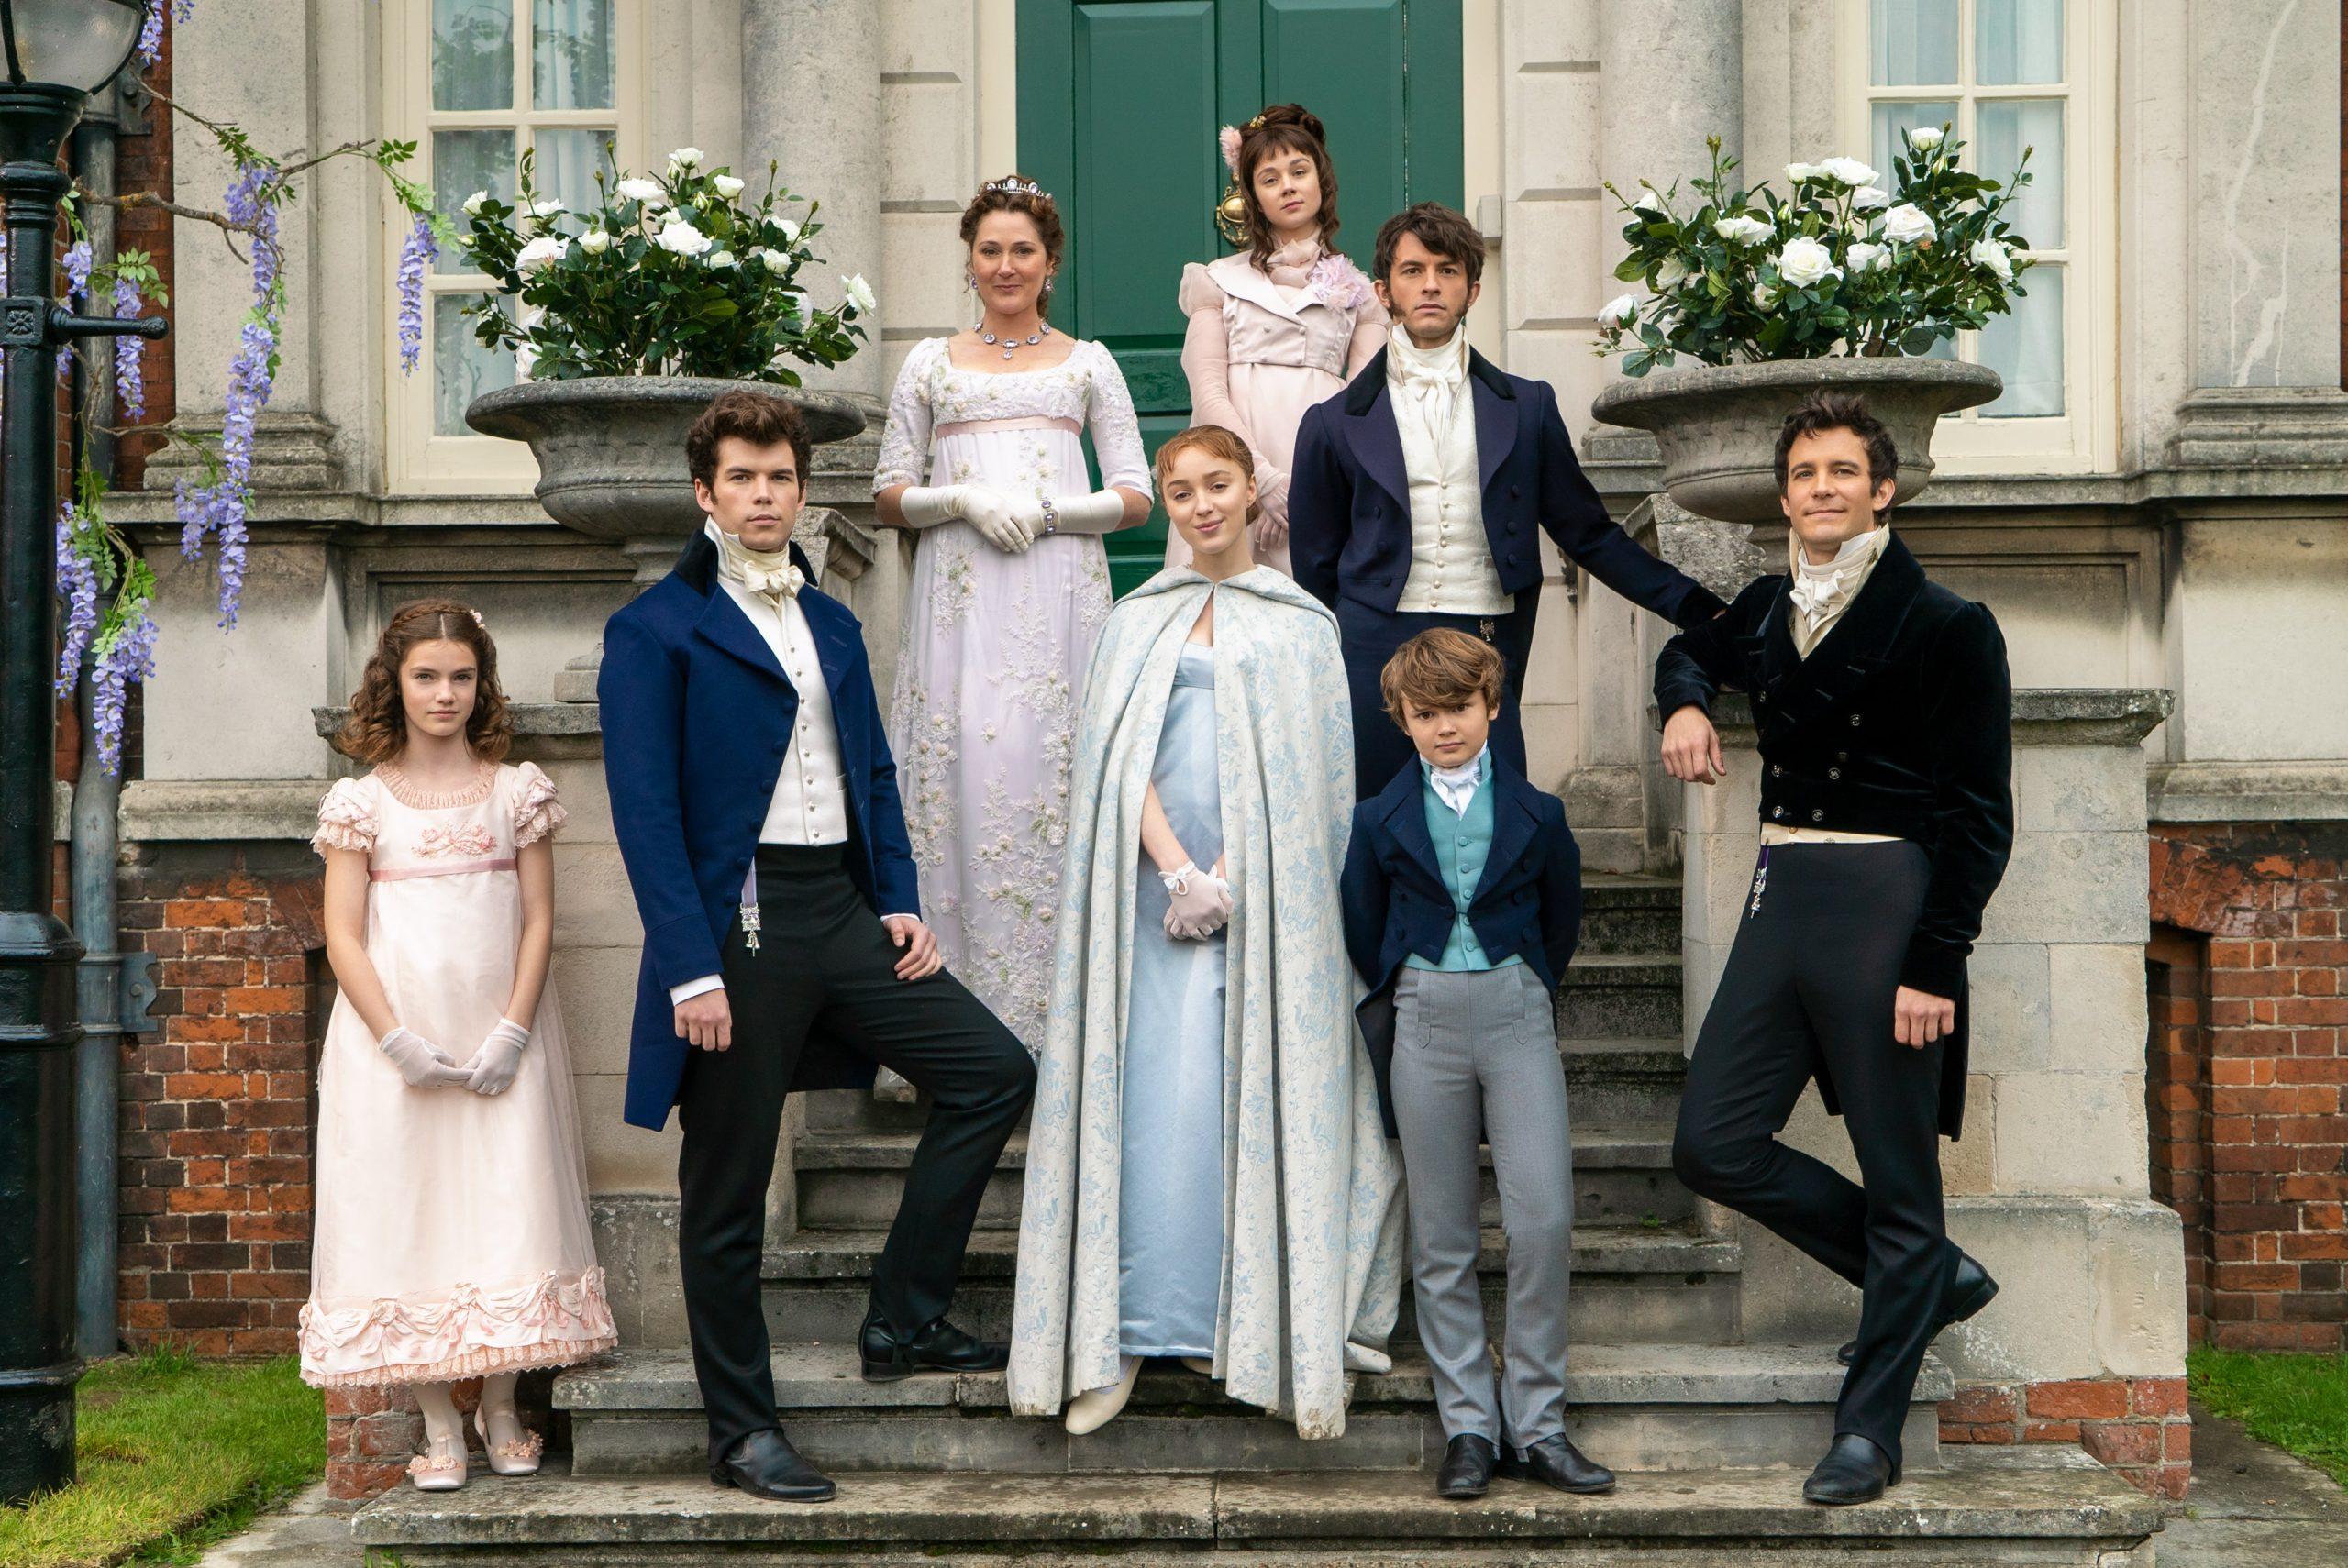 La familia Bridgerton al completo posando en la puerta de su residencia